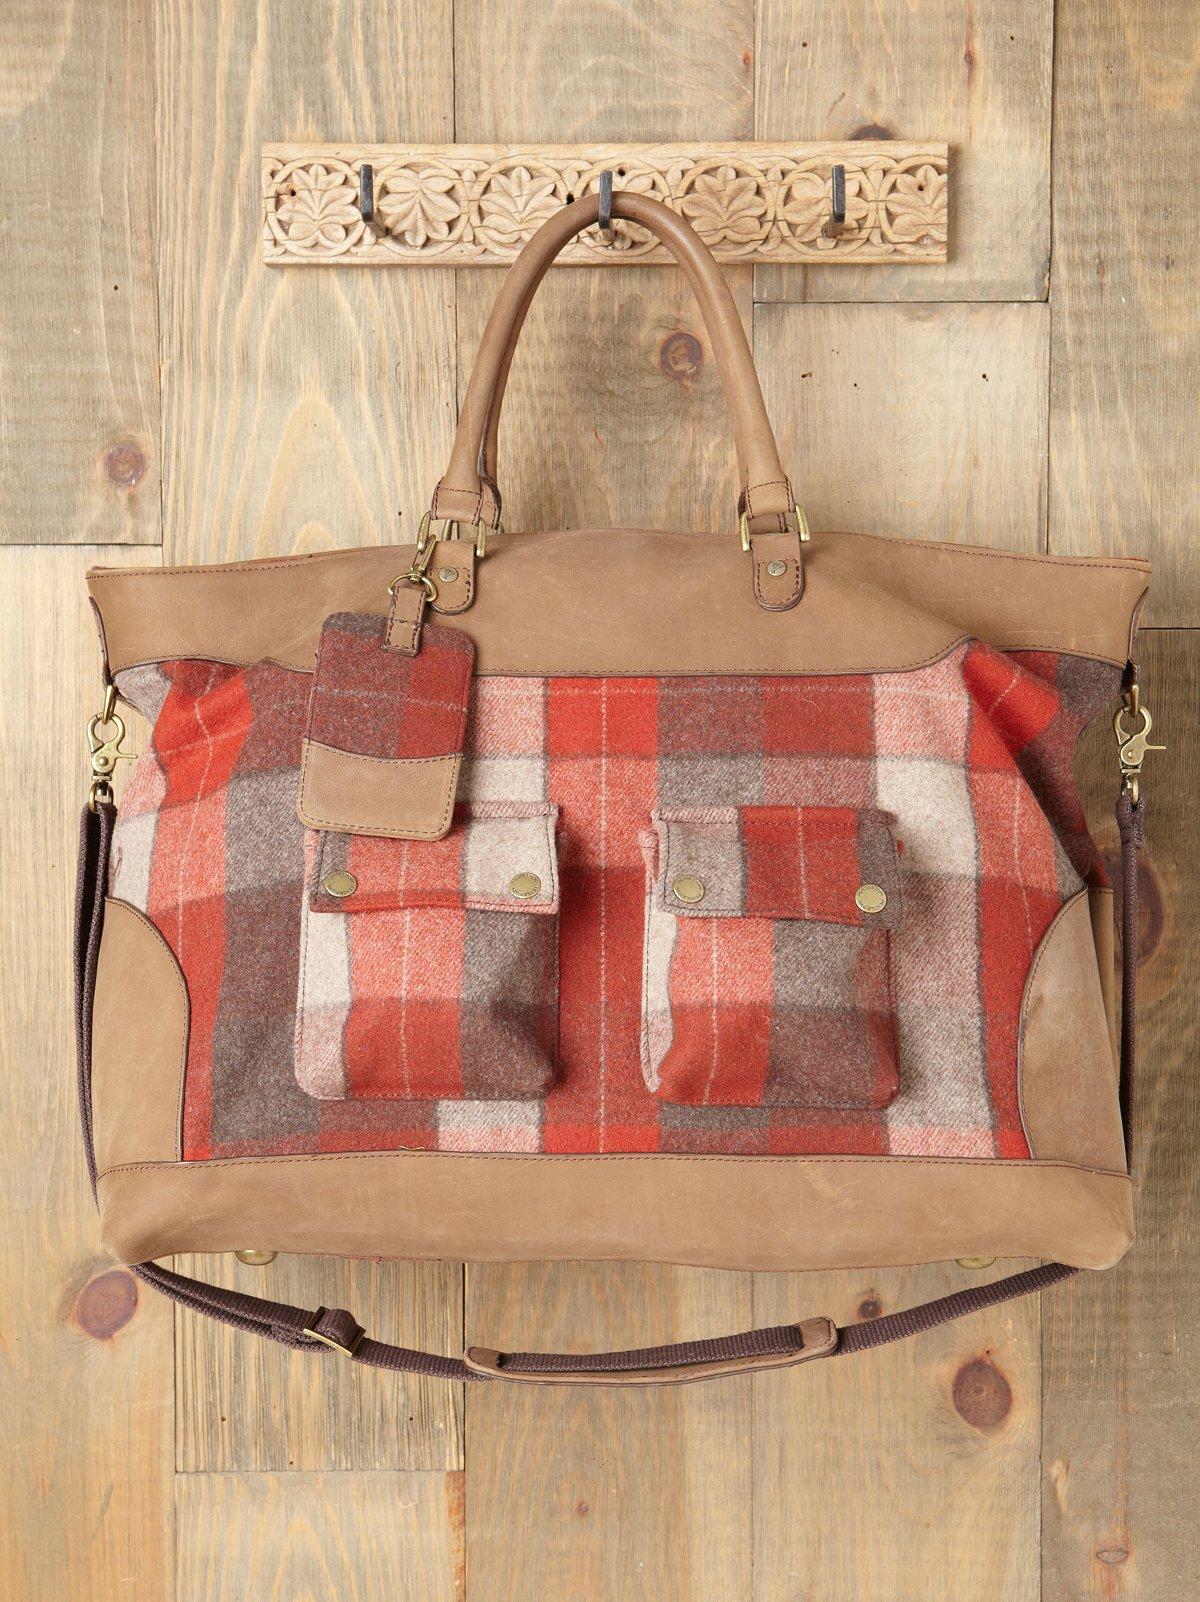 Astoria Luggage Bag